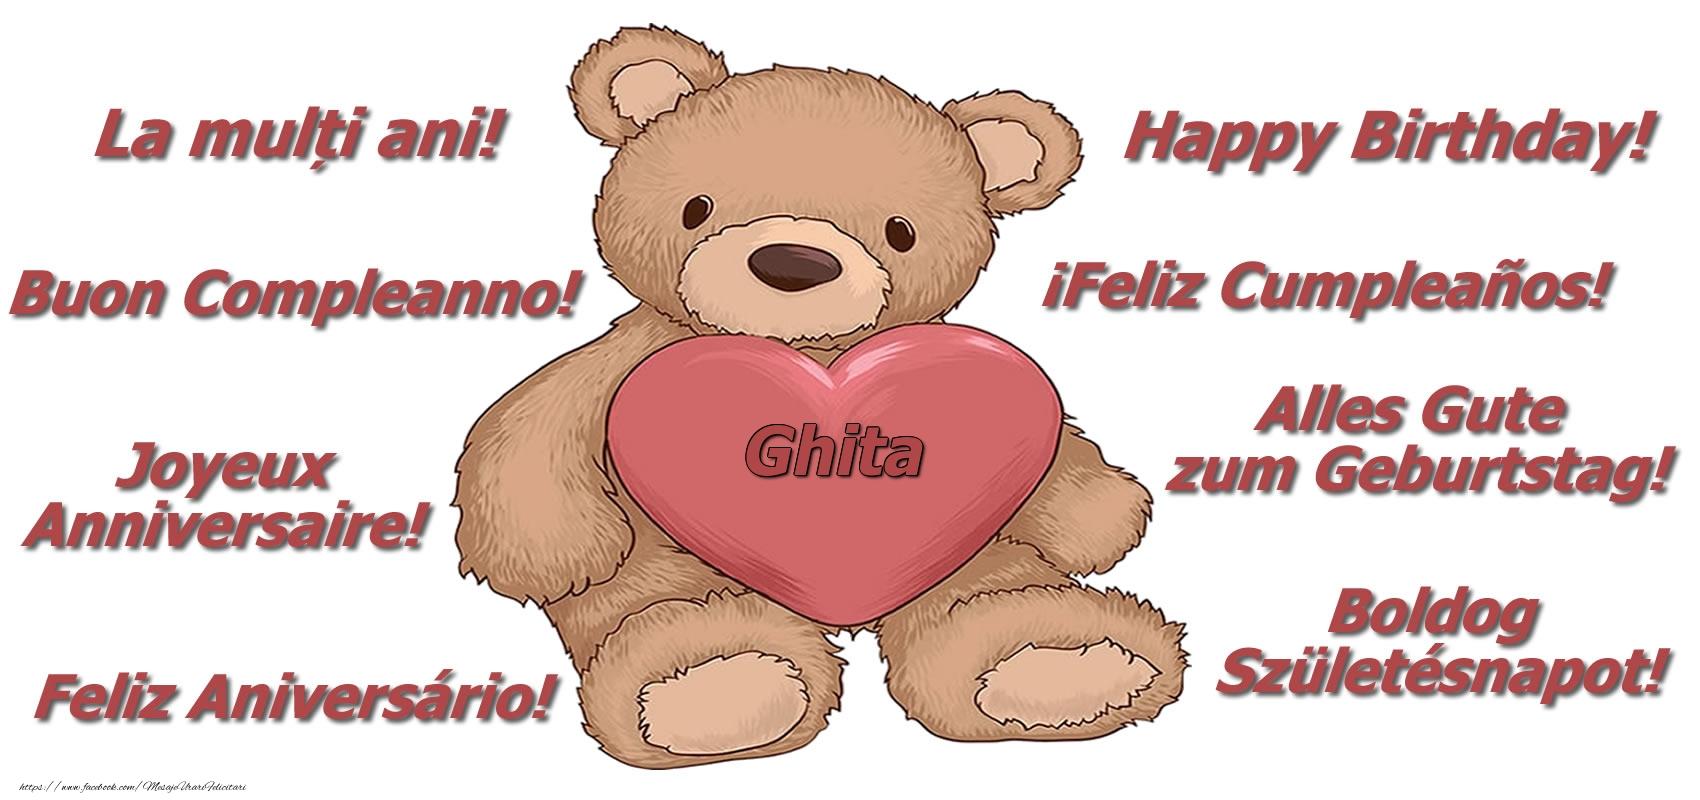 Felicitari de zi de nastere - La multi ani Ghita! - Ursulet